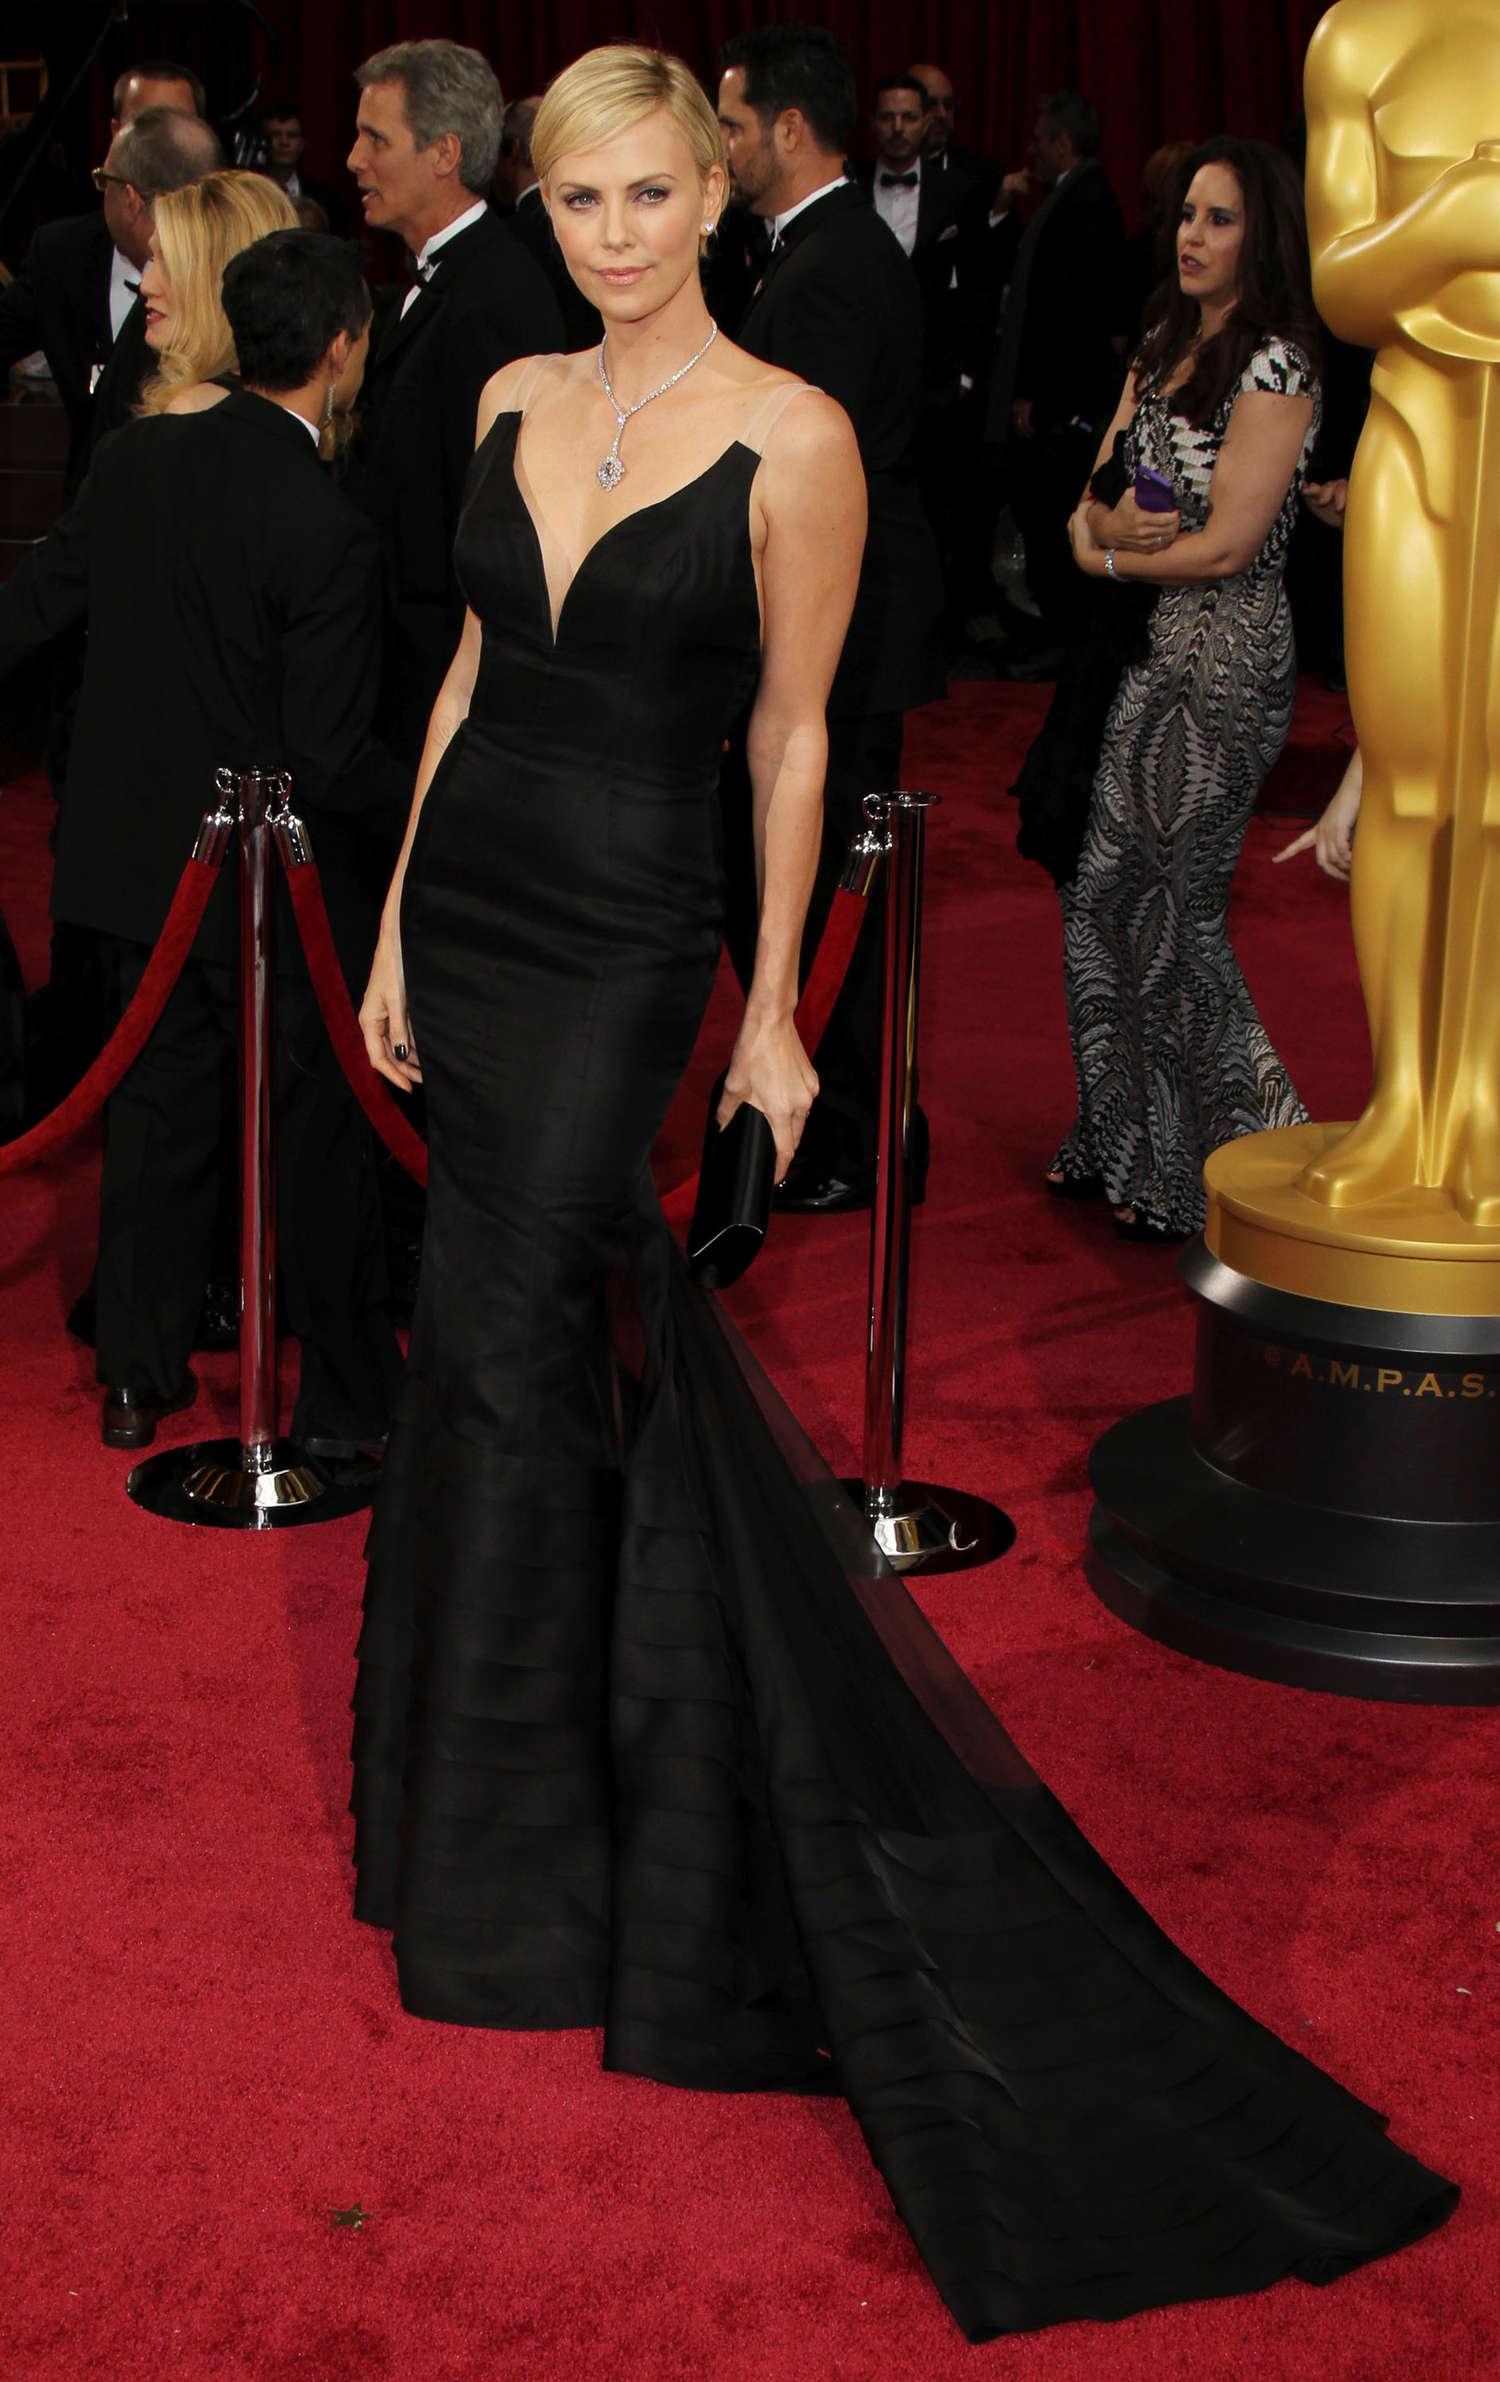 Charlize Theron 2014 : Charlize Theron: Charlize Theron -10